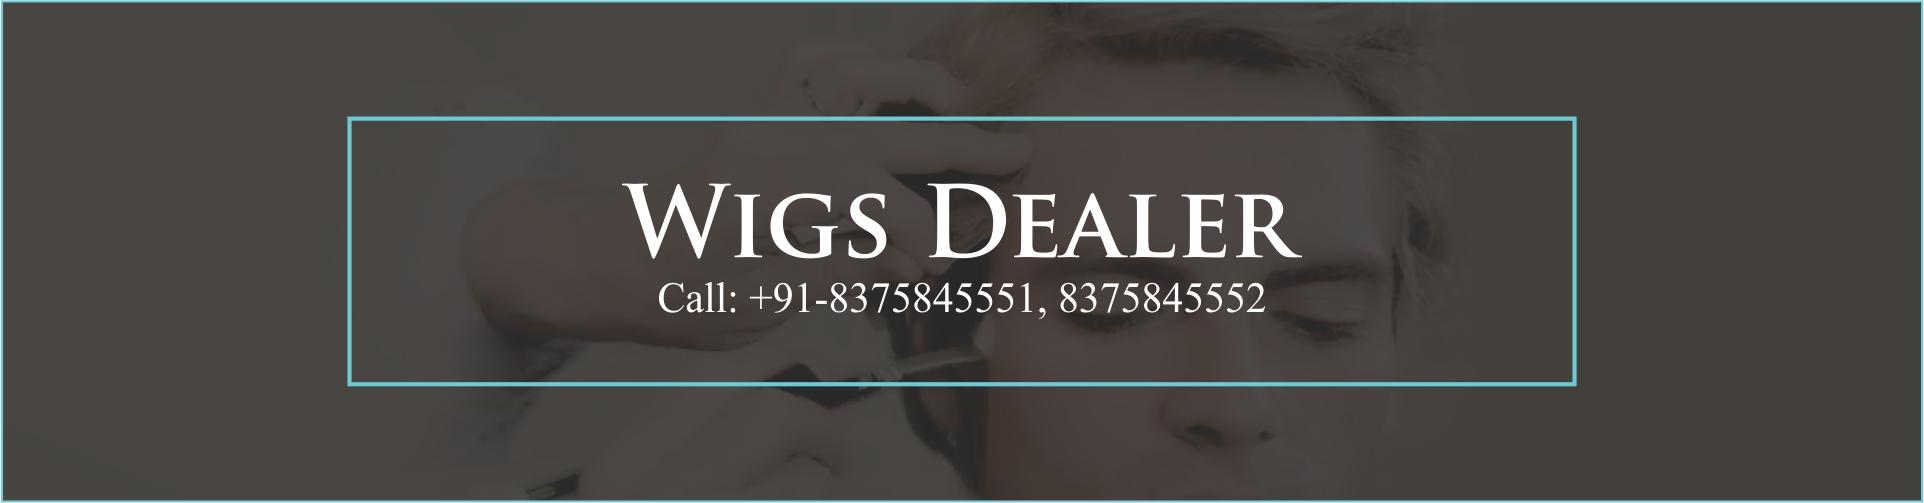 Wigs Dealer in Delhi - PHC Hair Clinic